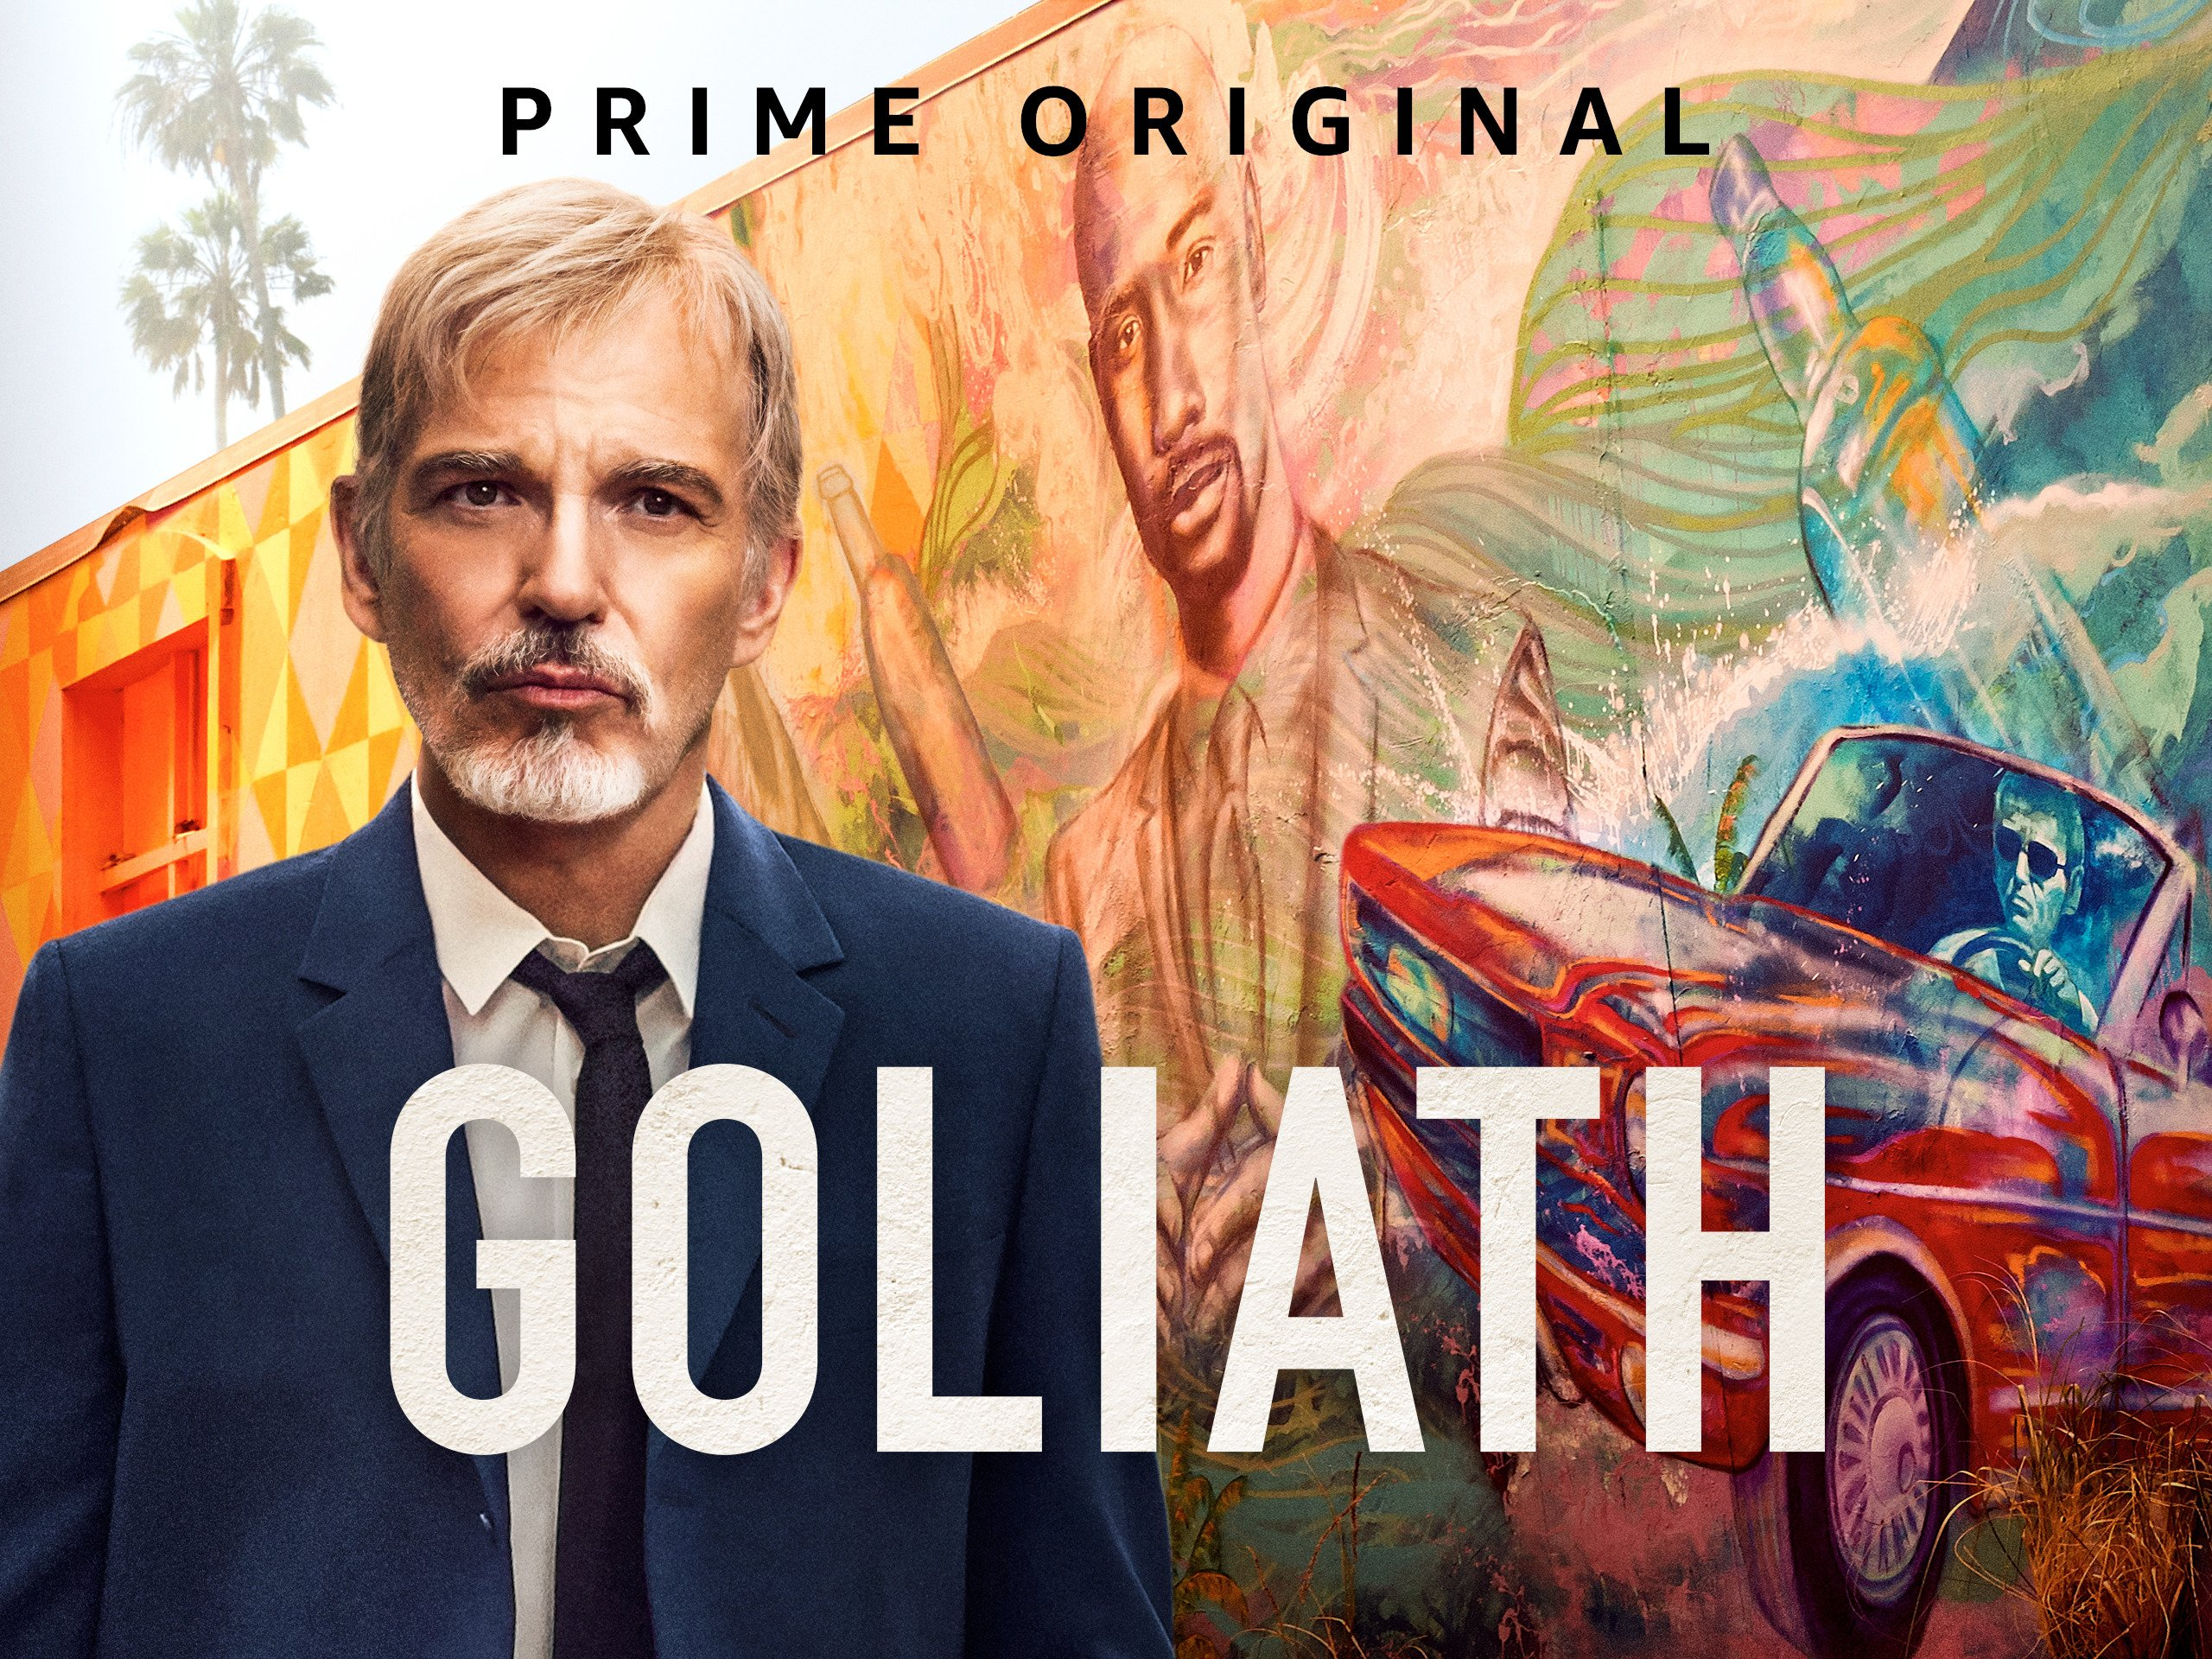 'Goliath' season 2 key art. [Amazon]